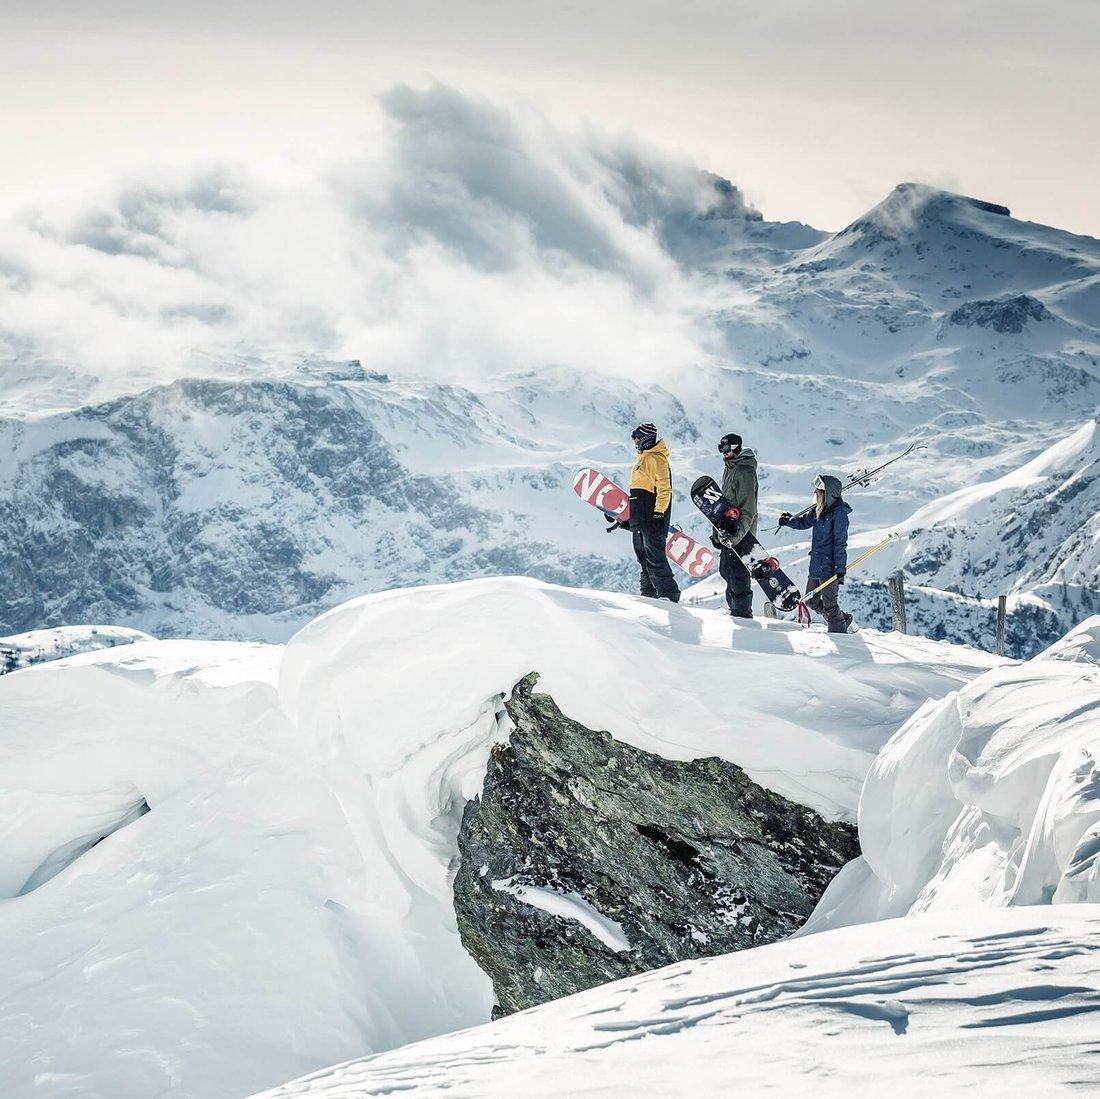 Flachau Hotel Piste Tauernhof Skifahren